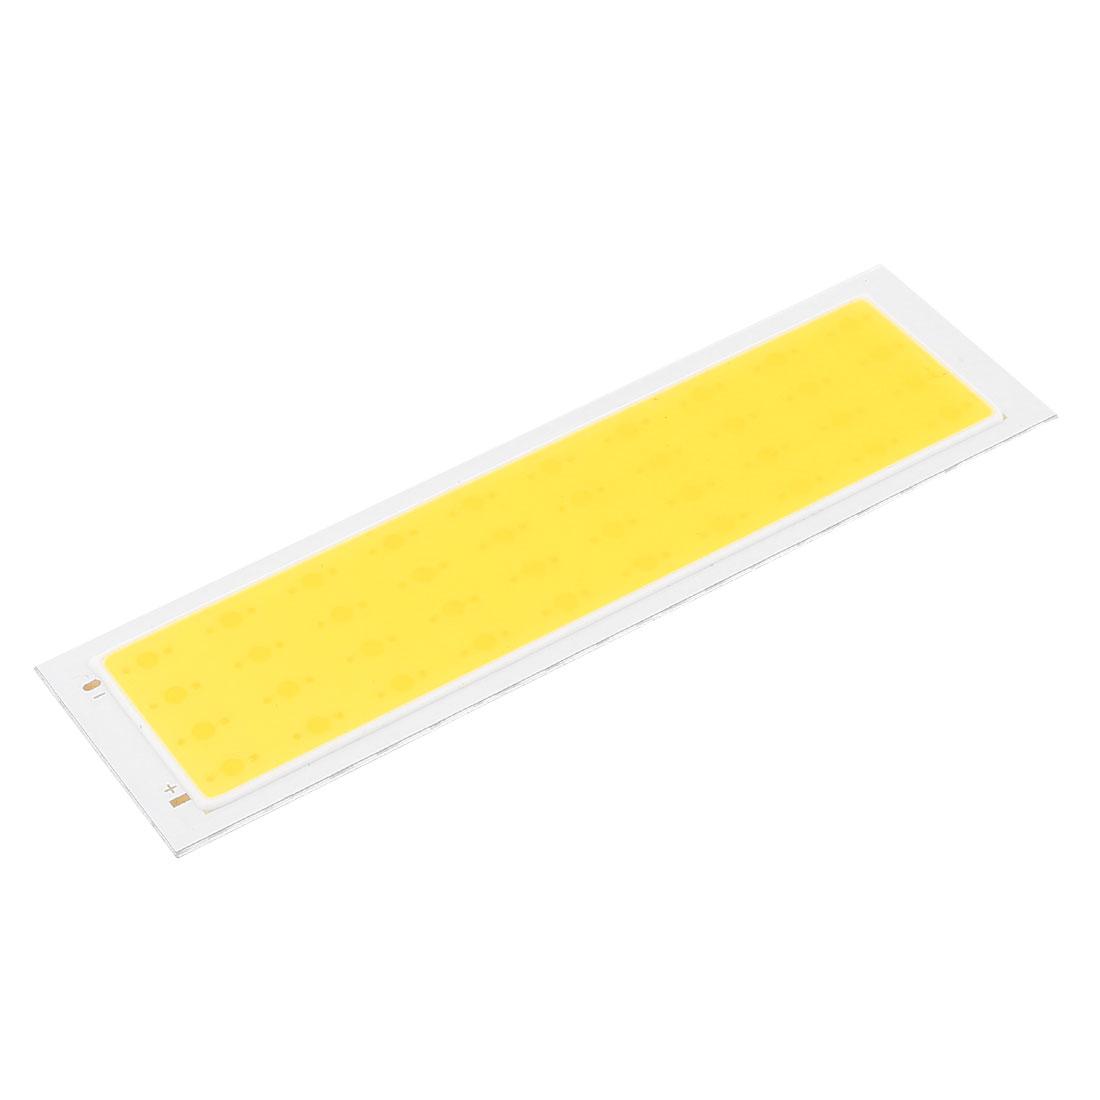 10W DC12-14V 900mA 80-90LM/W Warm White LED Light COB Lamp Beads Chip